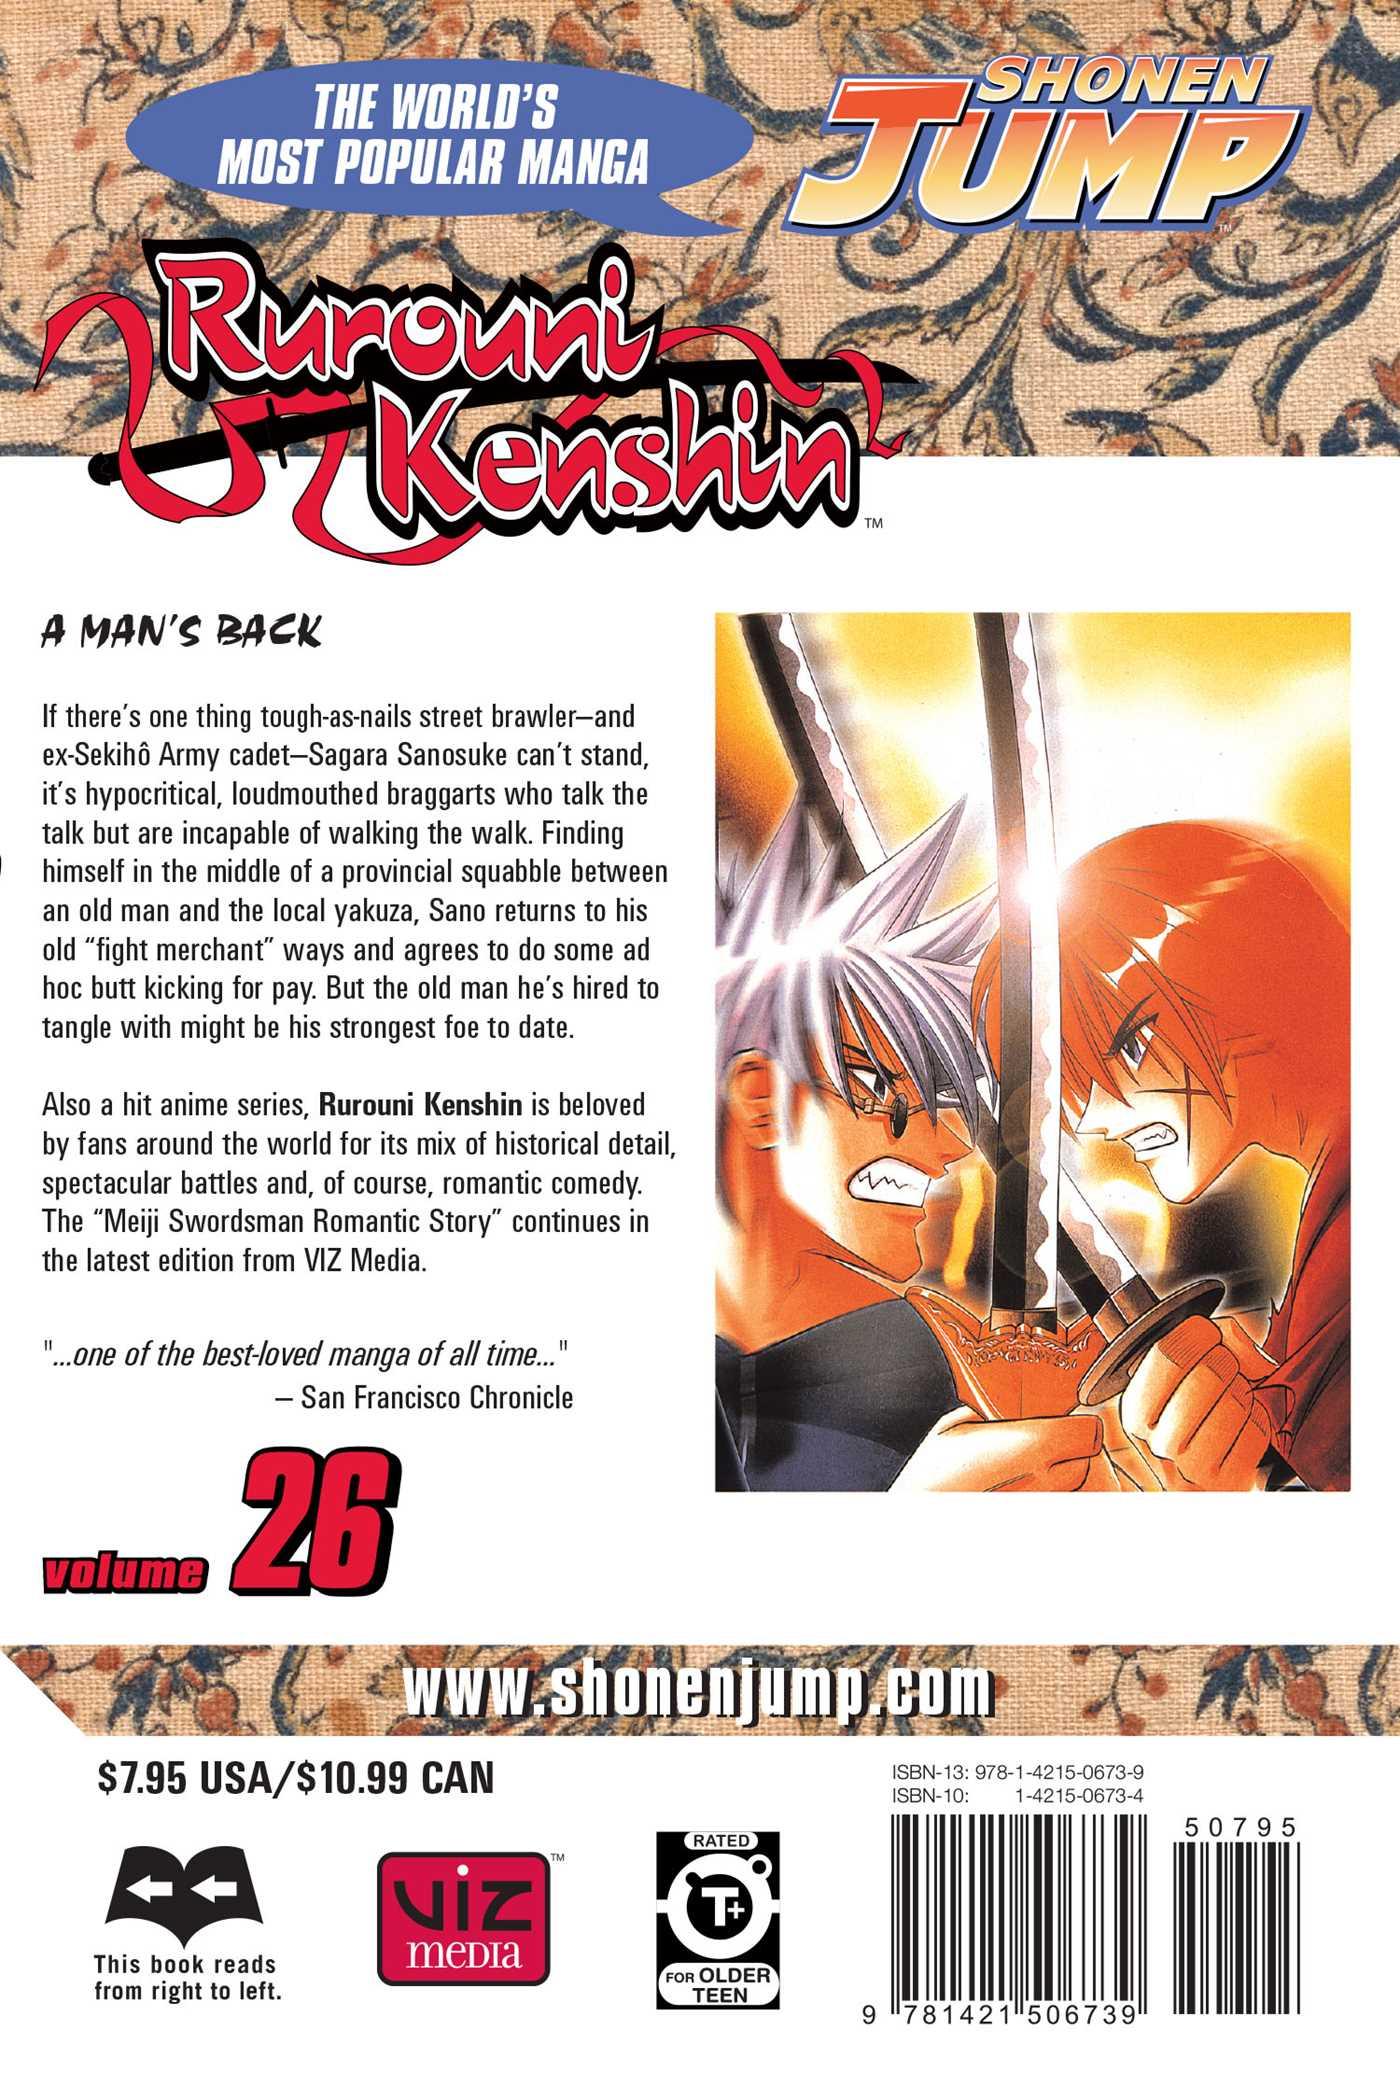 Rurouni Kenshin GN Vol 26 manga Shonen Jump historical romantic comedy Viz new